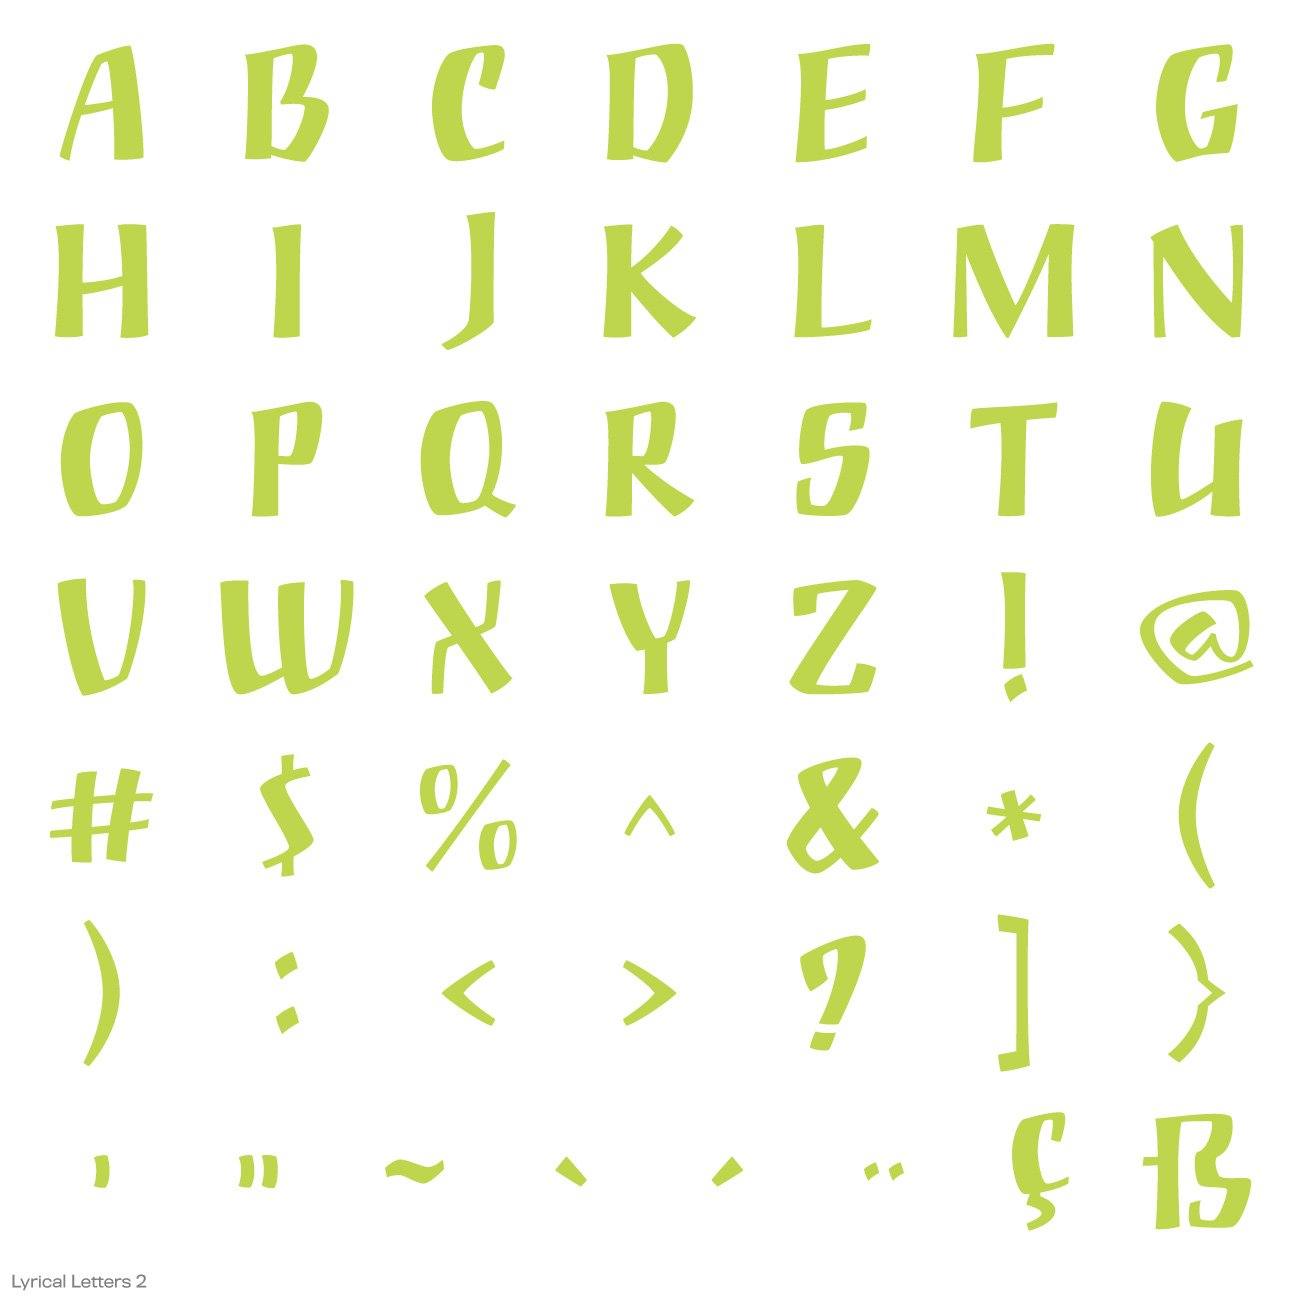 Cricut Lyrical Letters 2 Cartridge by Cricut (Image #23)